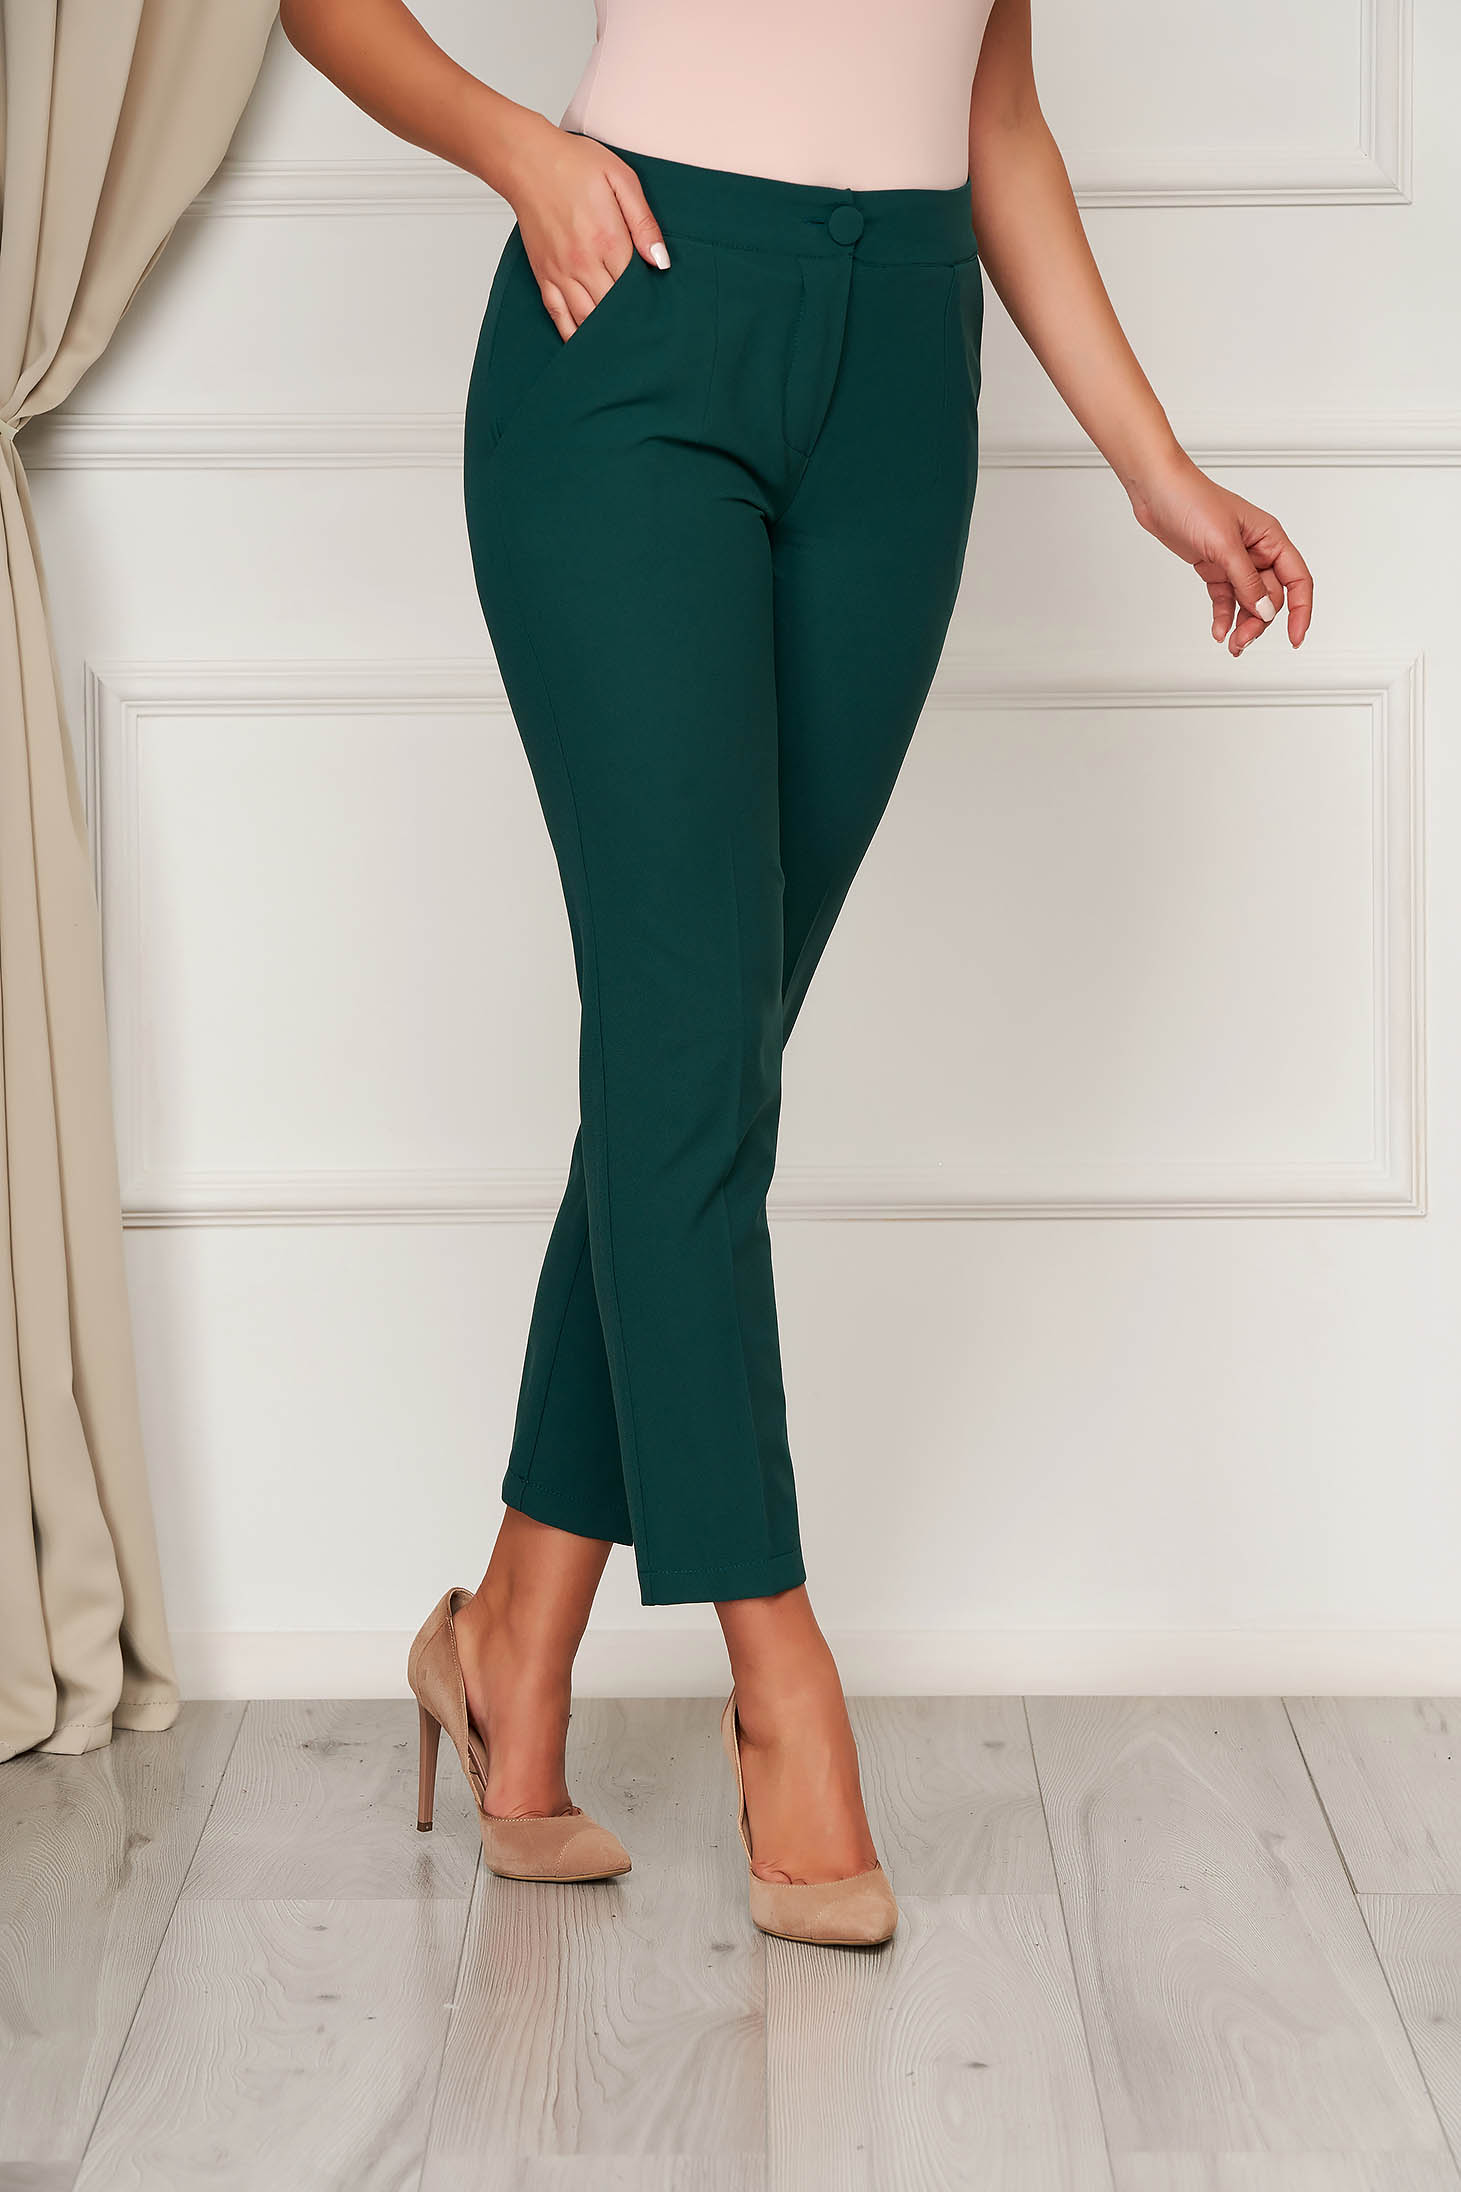 Trousers darkgreen office cloth medium waist straight